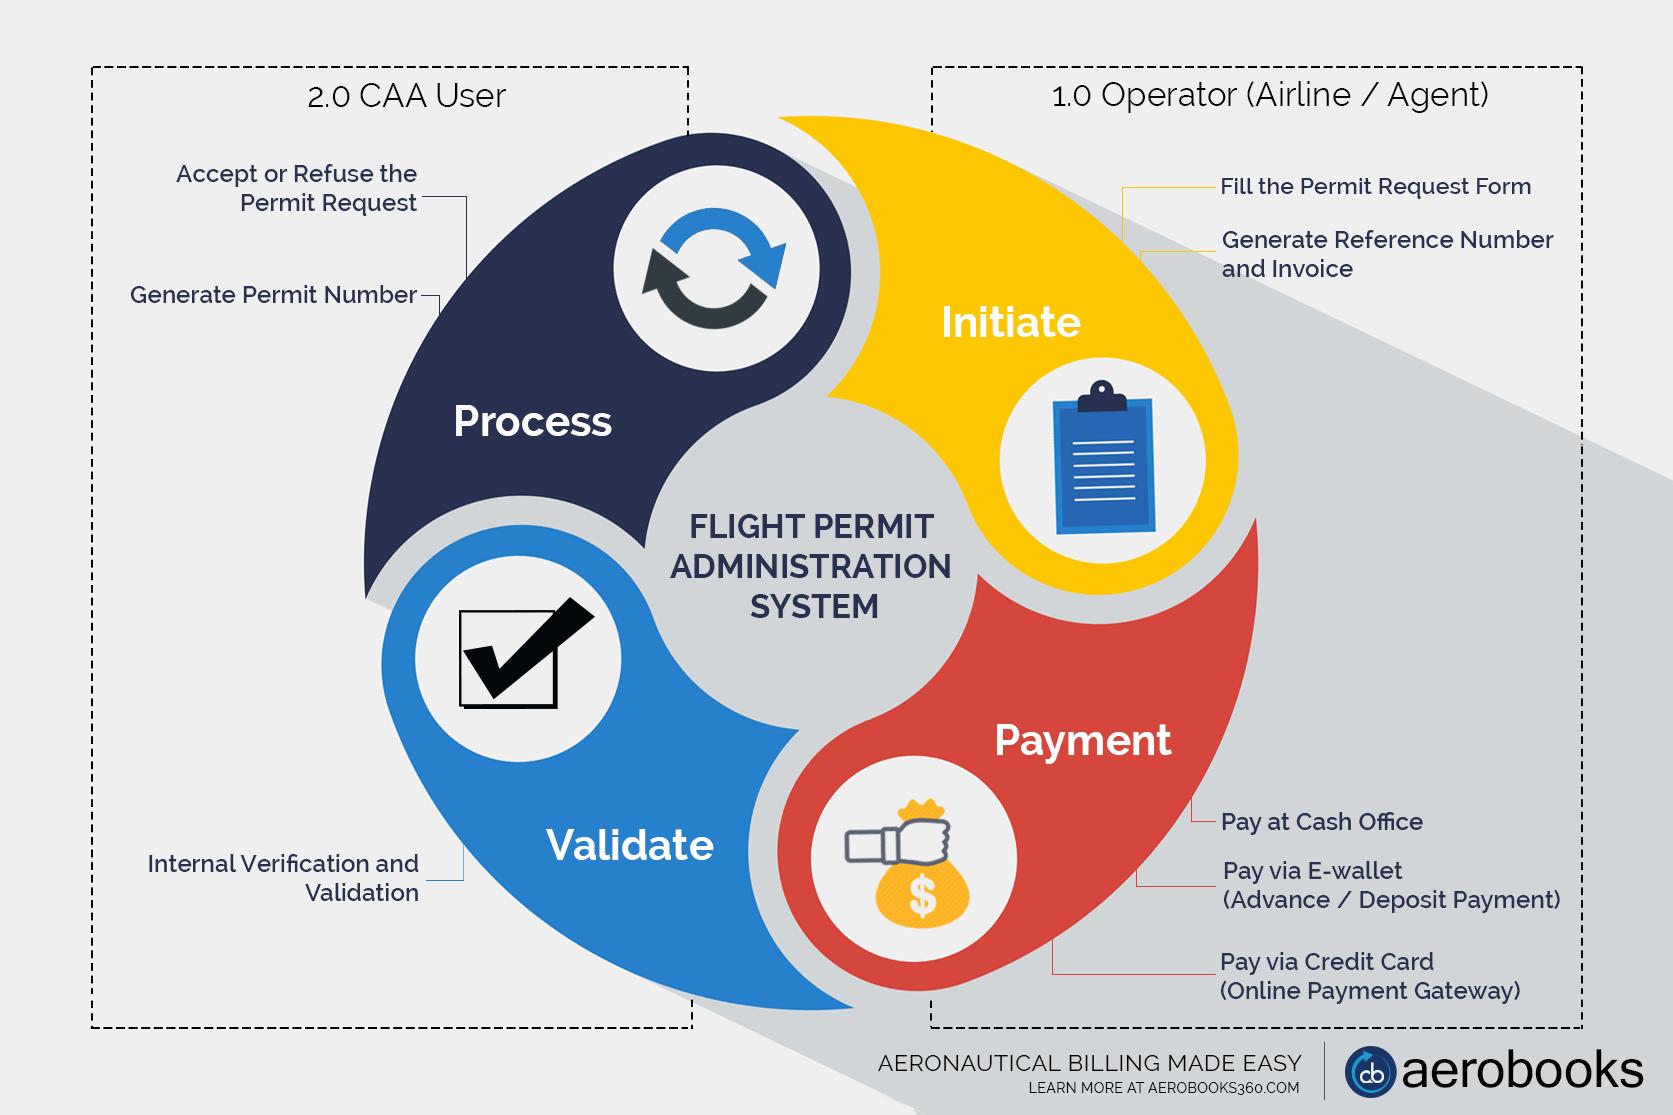 Flight Permit Administration System